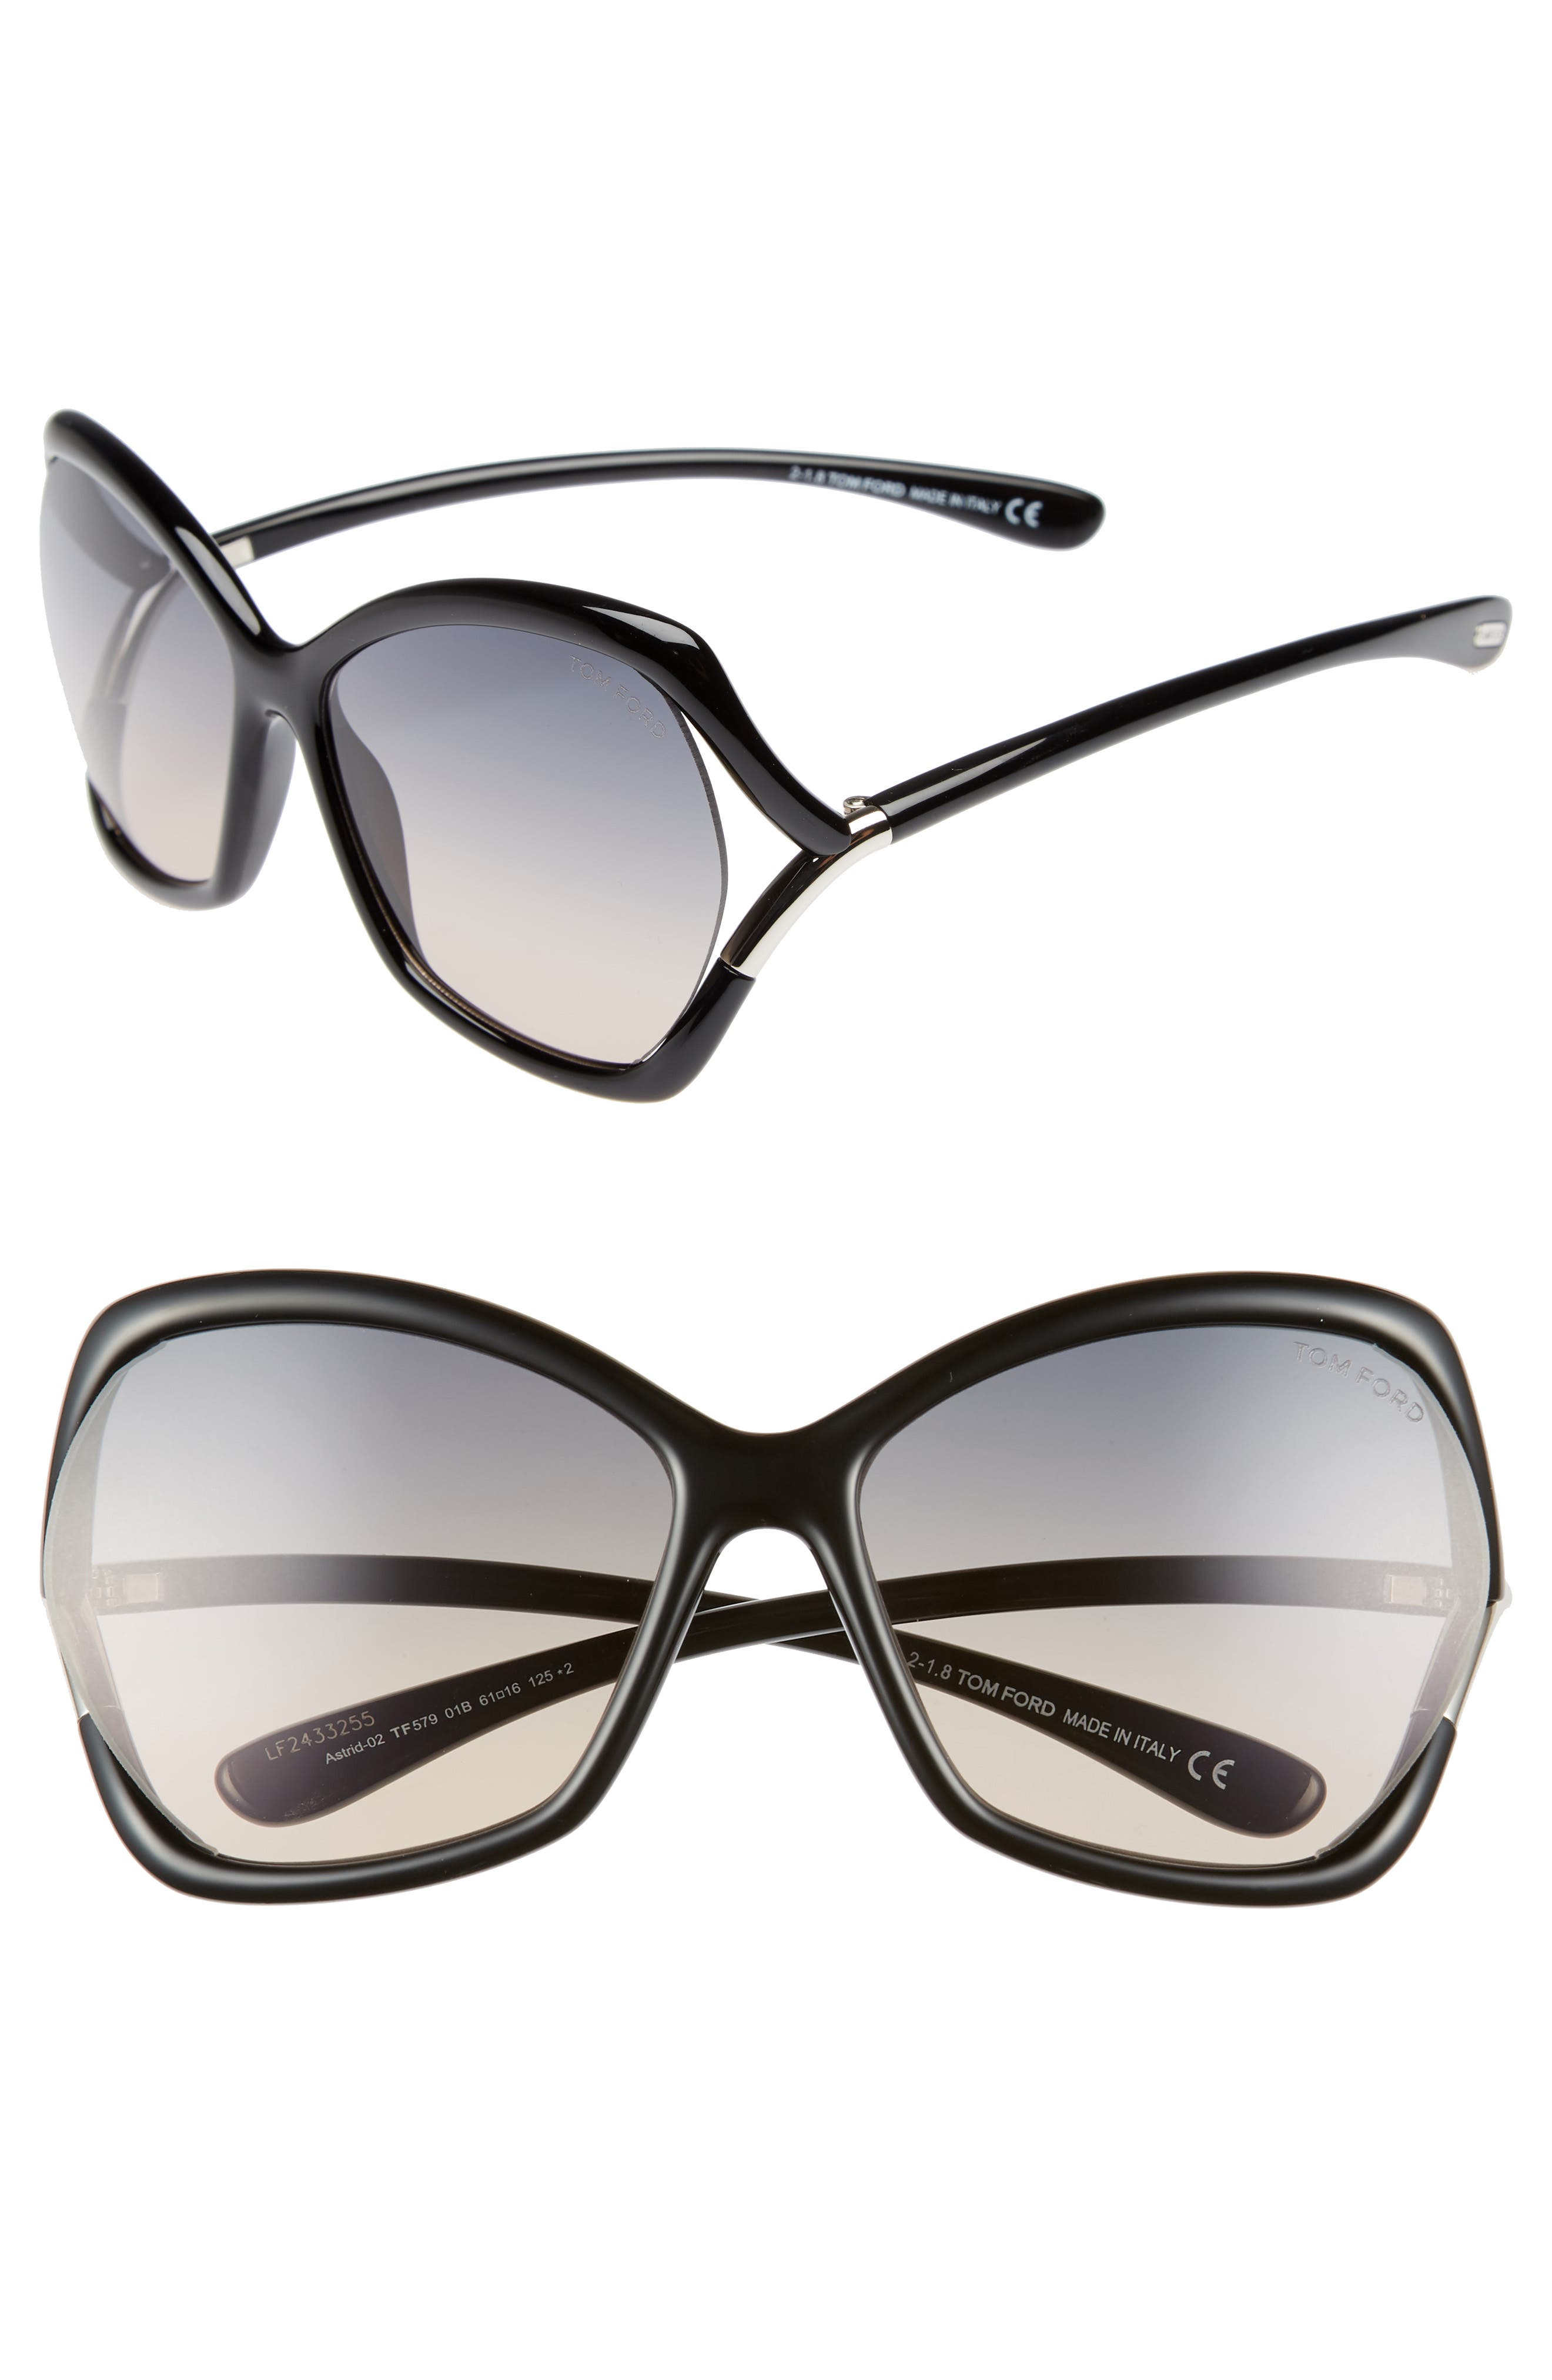 Astrid 61mm Geometric Sunglasses,                             Main thumbnail 1, color,                             SHINY BLACK/ GRADIENT SMOKE